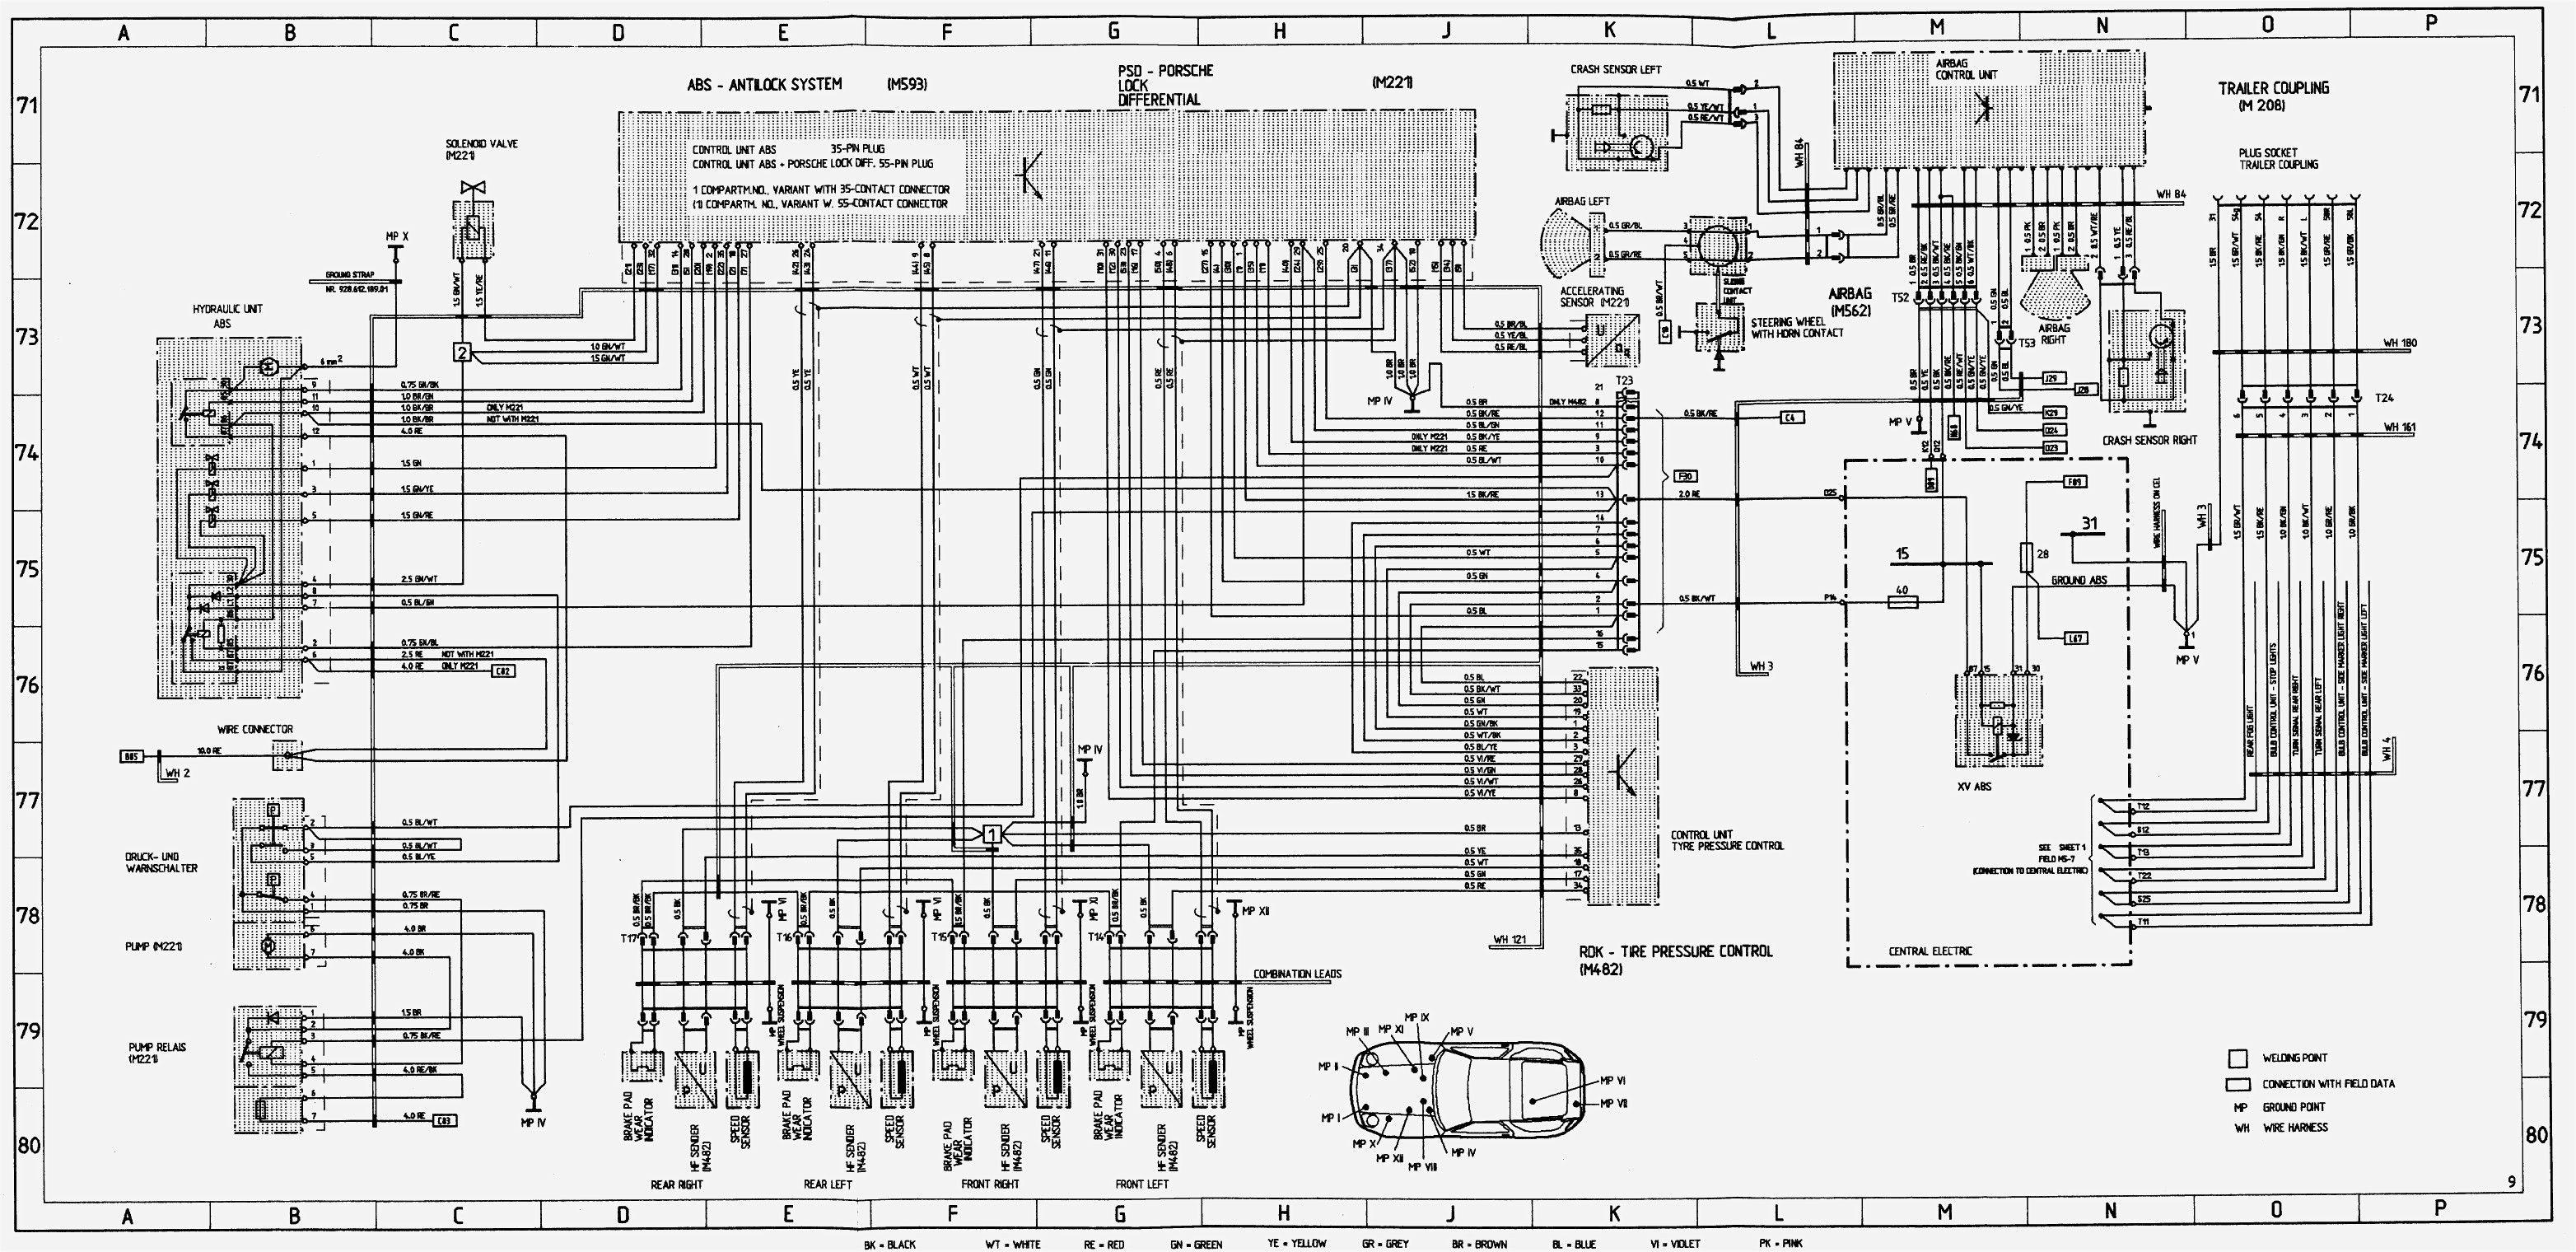 Unique Electrical Riser Diagram Template Diagram Wiringdiagram Diagramming Diagramm Visuals Visualisa Electrical Wiring Diagram Bmw E46 Electrical Wiring